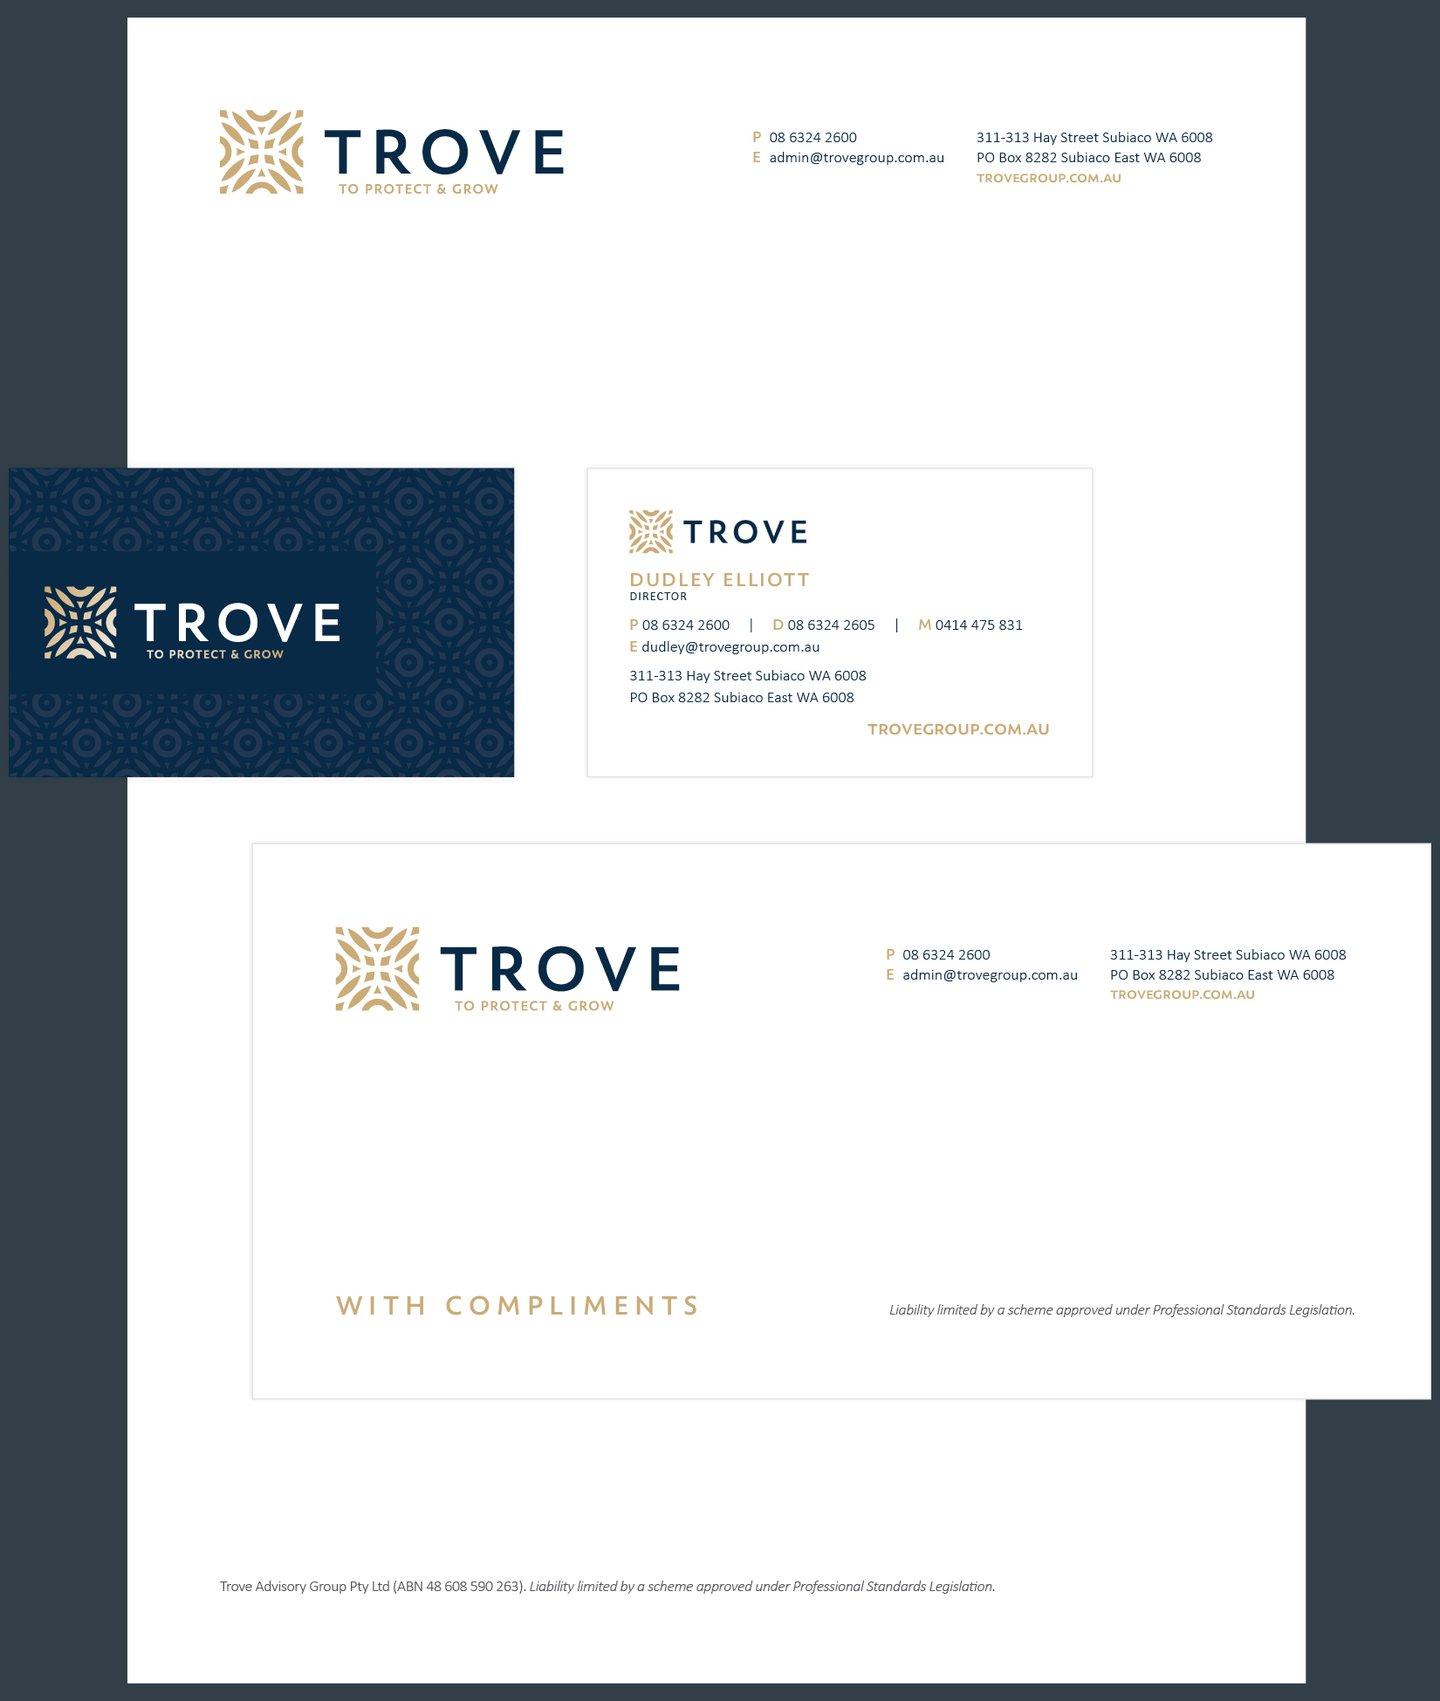 Trove-Project-v2-3.jpg